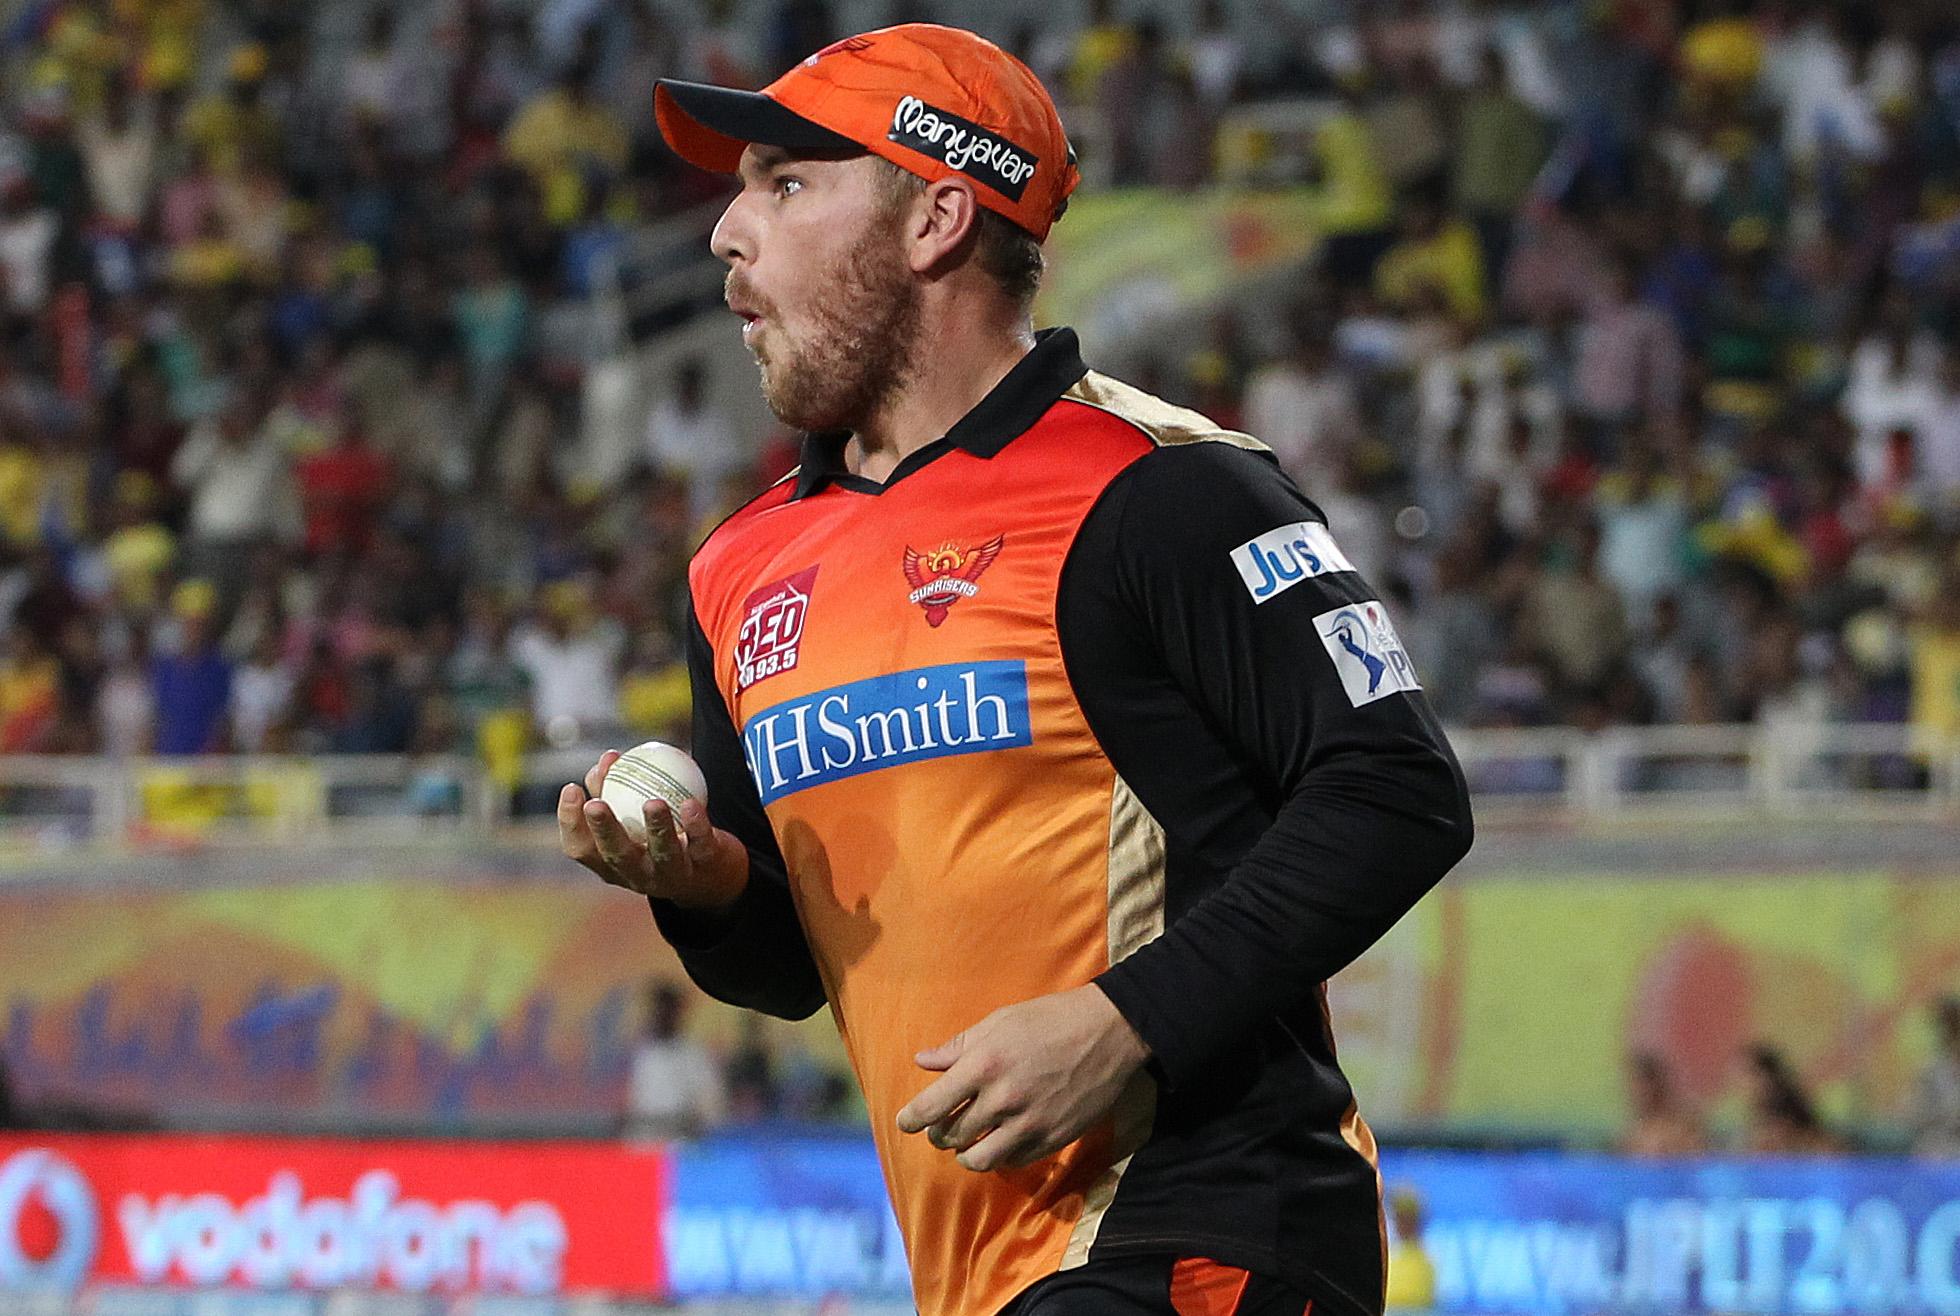 Finch in 2014 with Sunrisers Hyderabad // BCCI